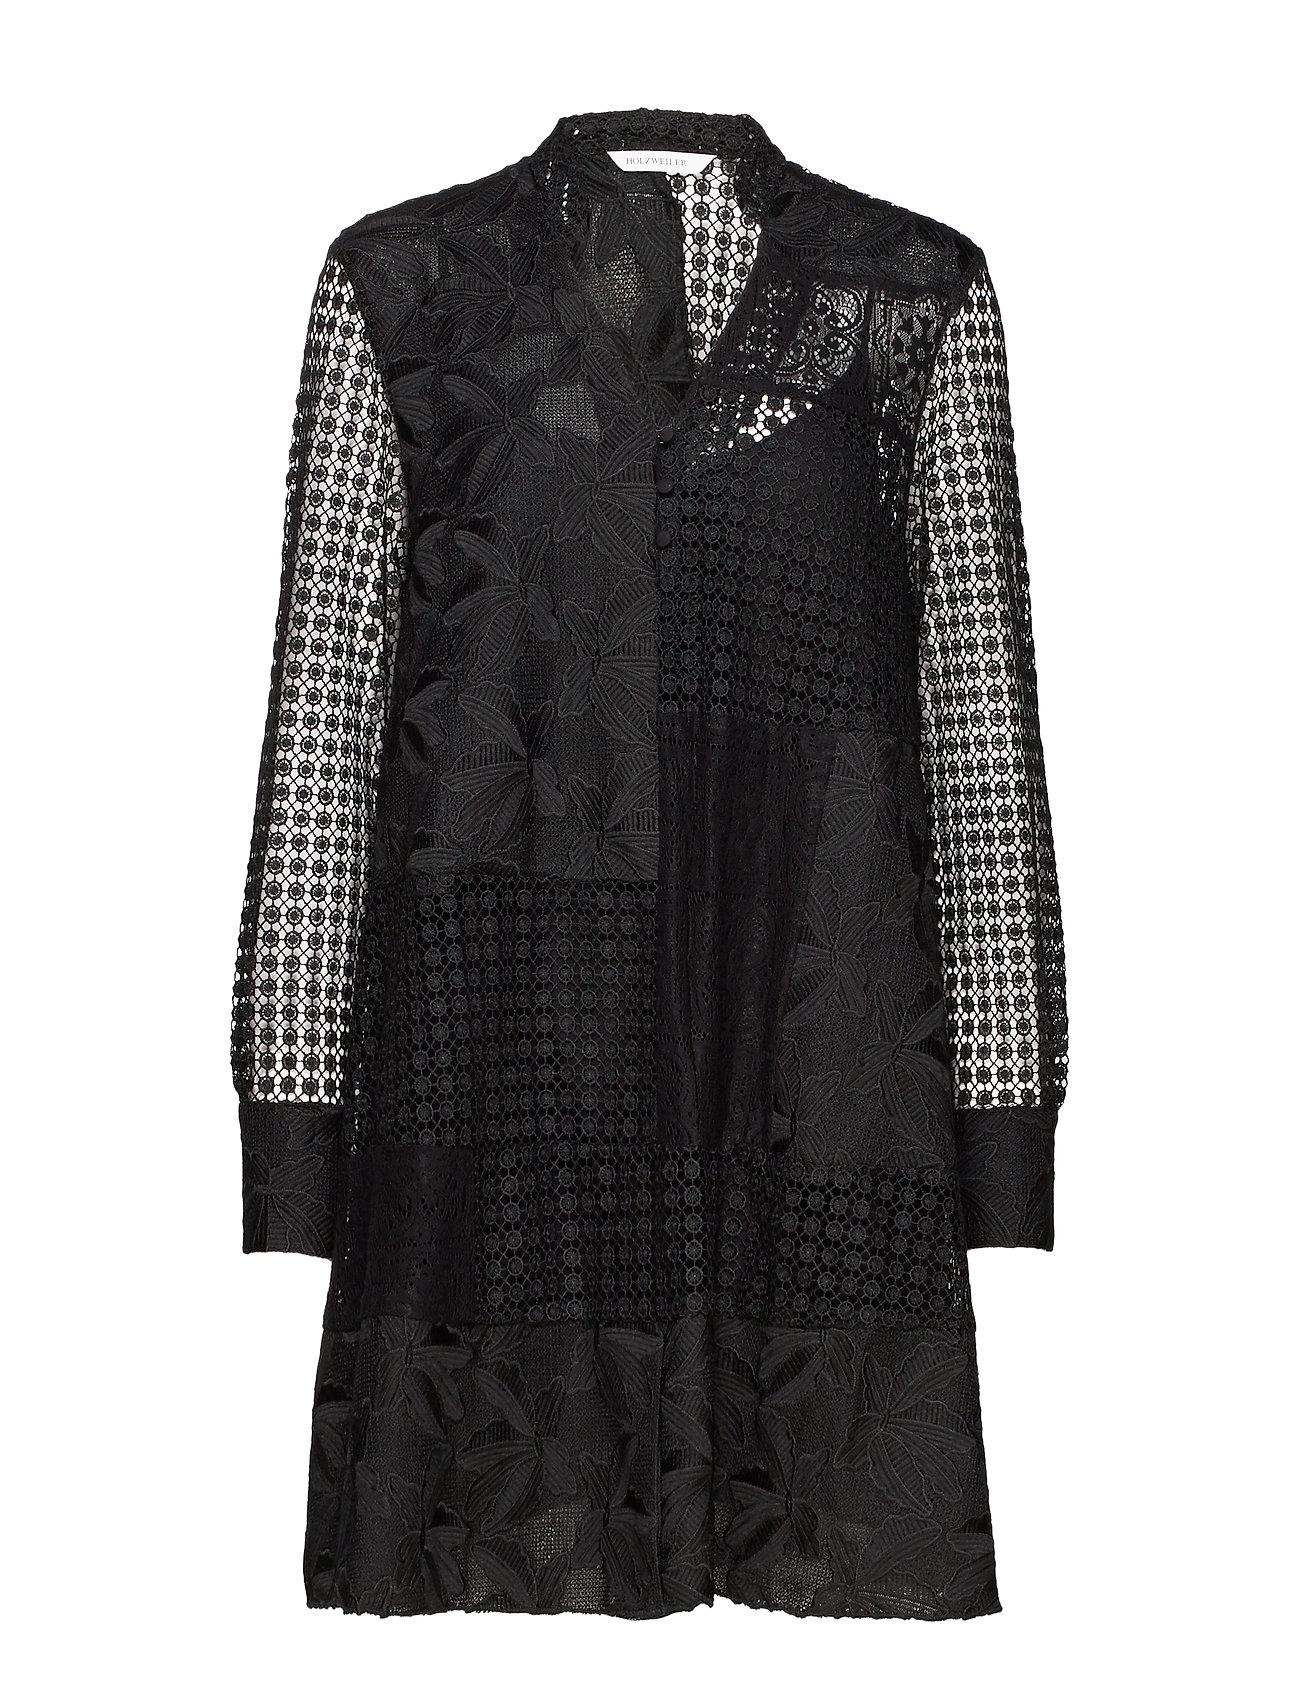 Image of Affair Dress Kort Kjole Sort HOLZWEILER (3302472865)